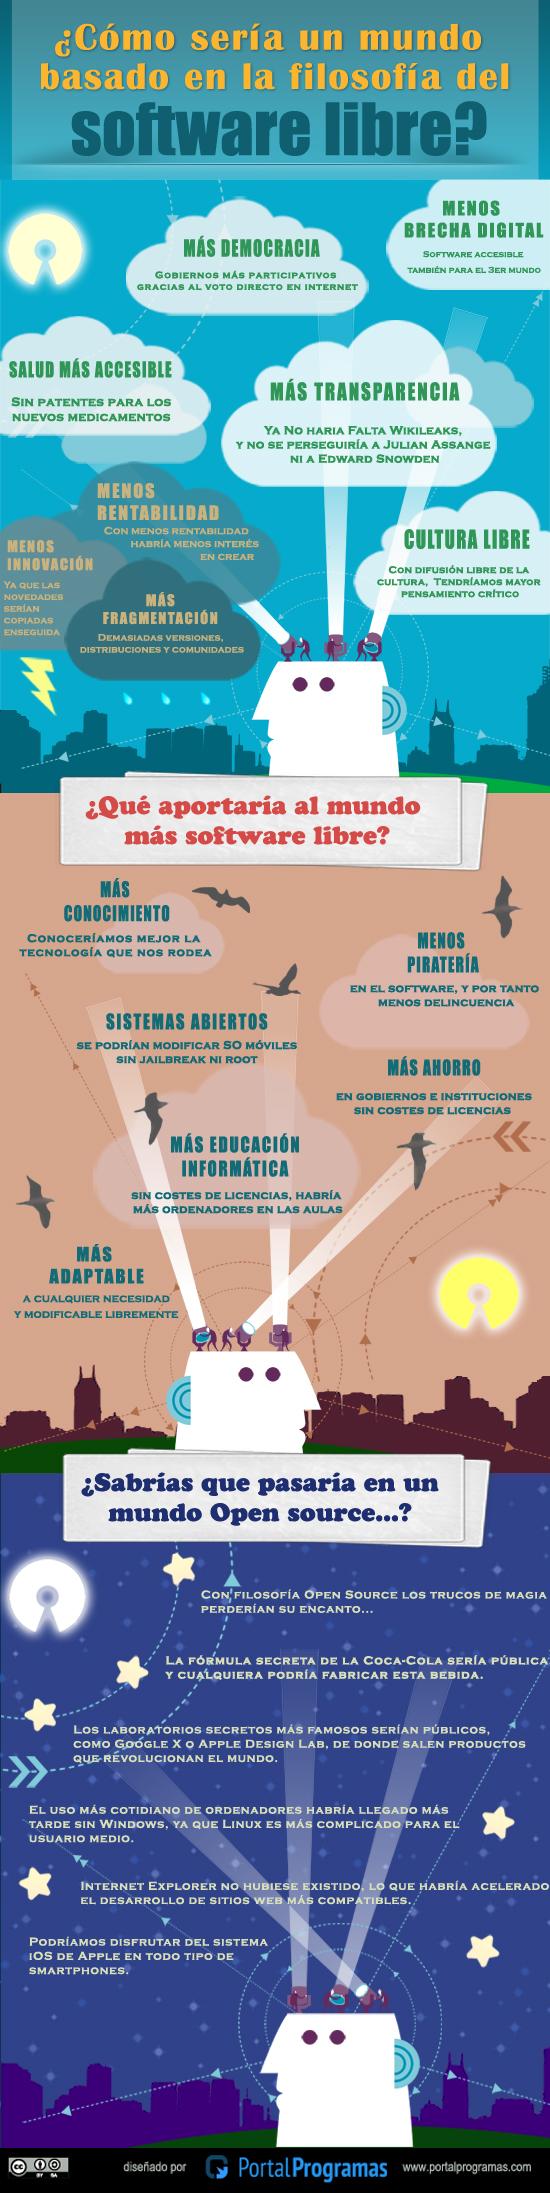 el-mundo-segun-software-libre